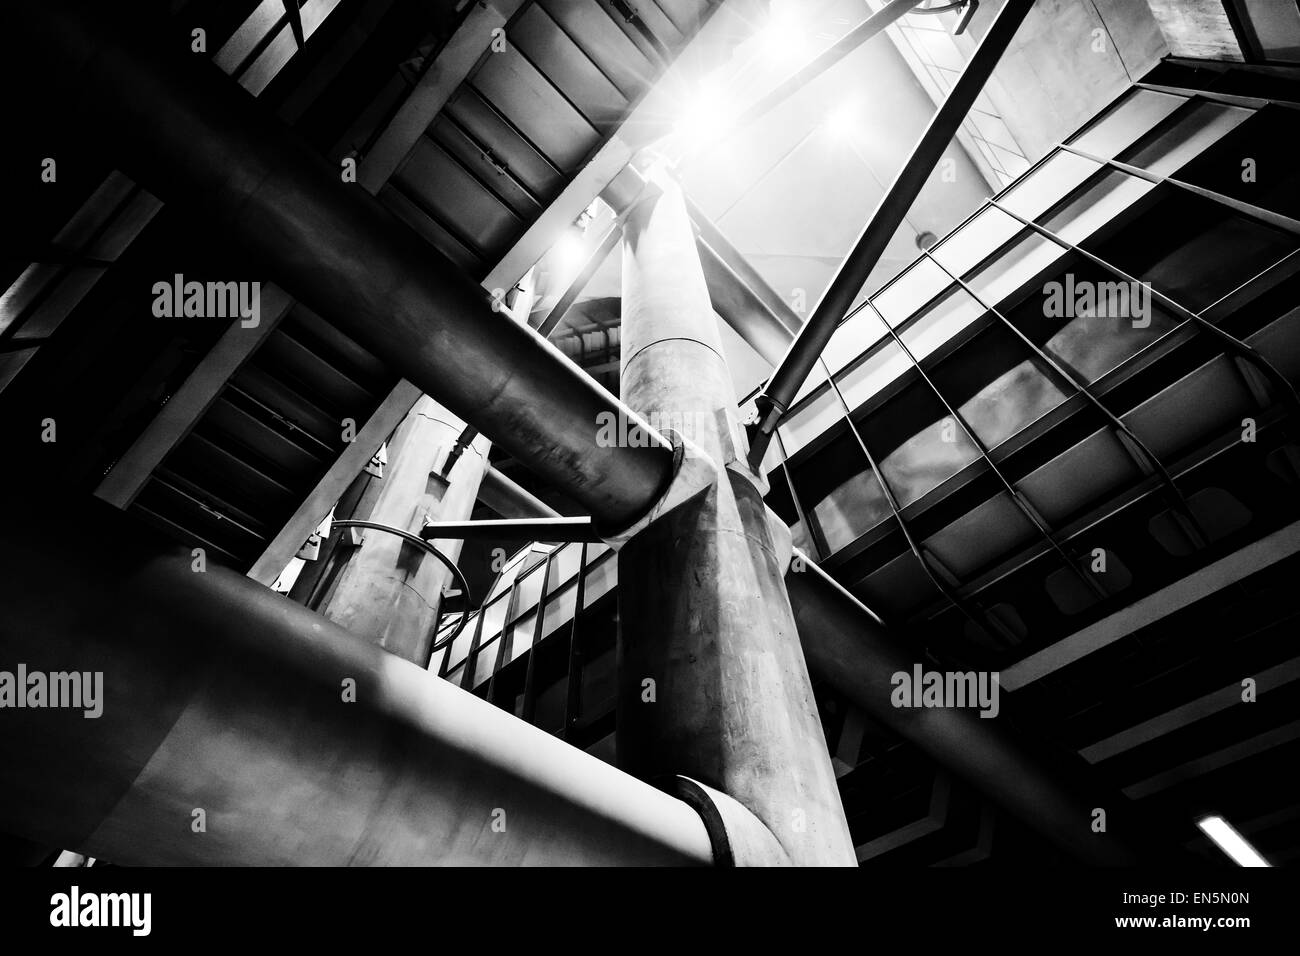 Deep in the bottom of Westminster's tube station, taken 2014 Stock Photo